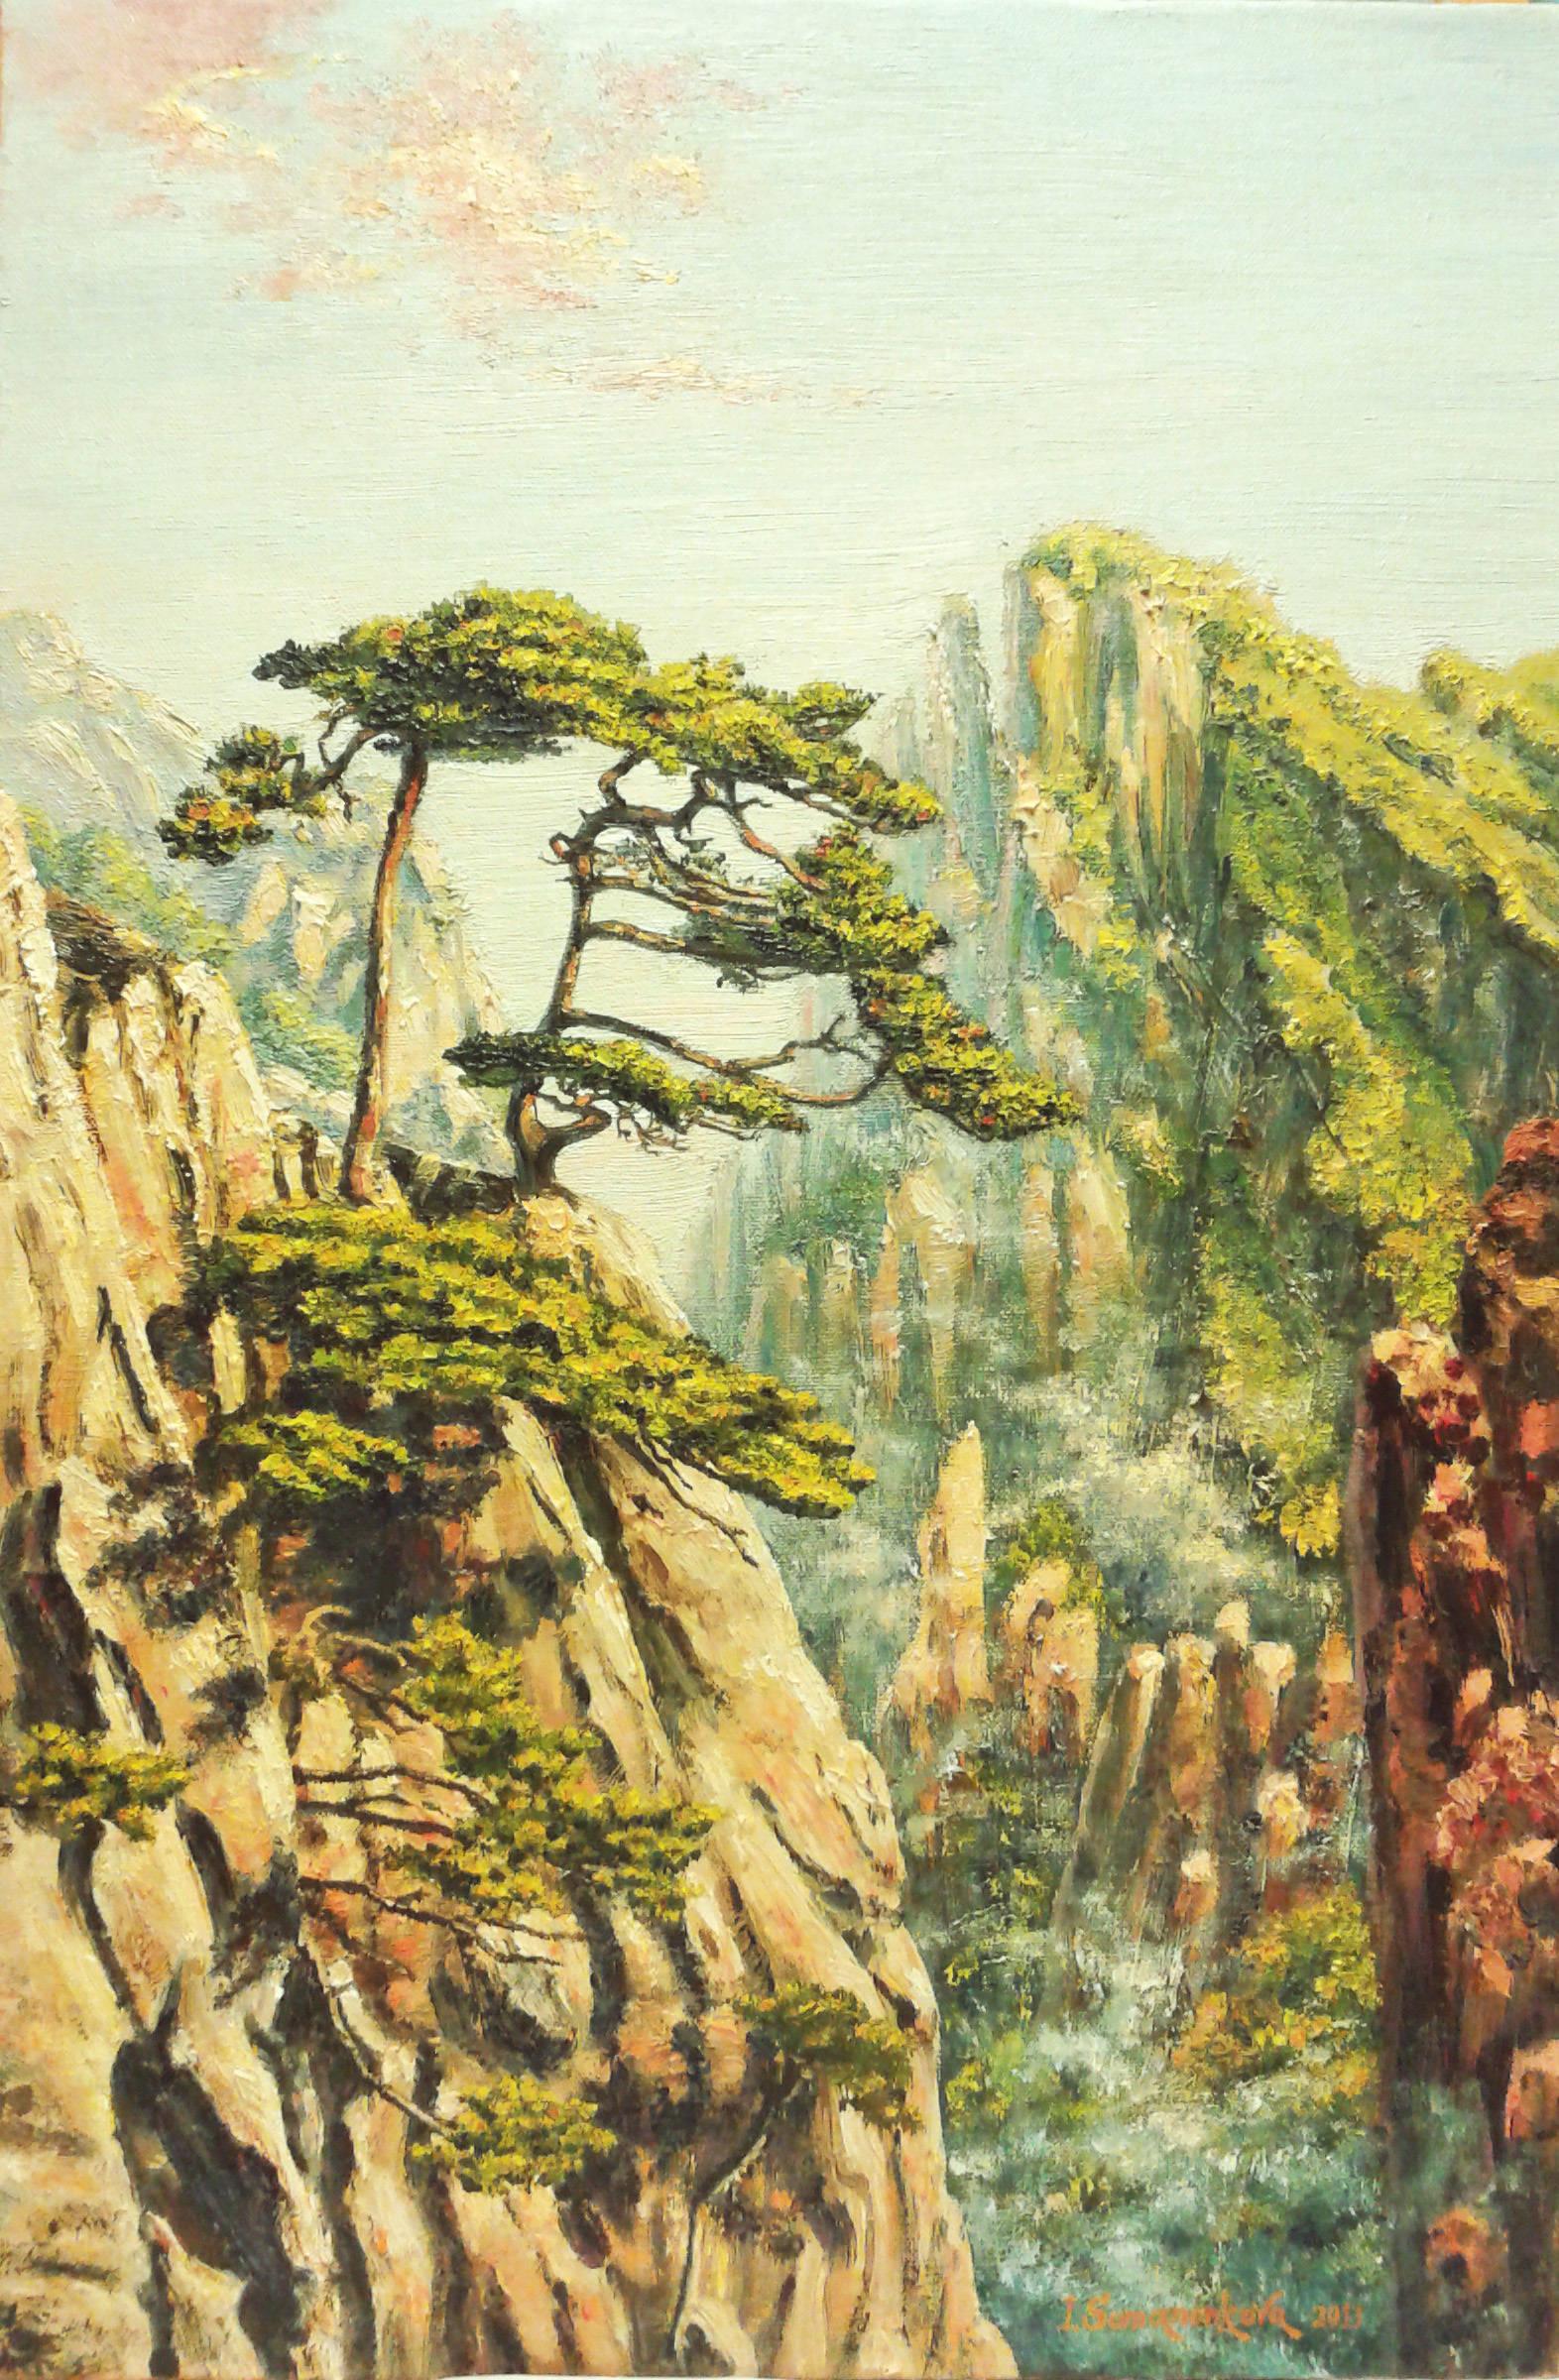 Воздушные горы Китая / Airy mountains of China 60 x 40 cм, холст, масло, 2013 г